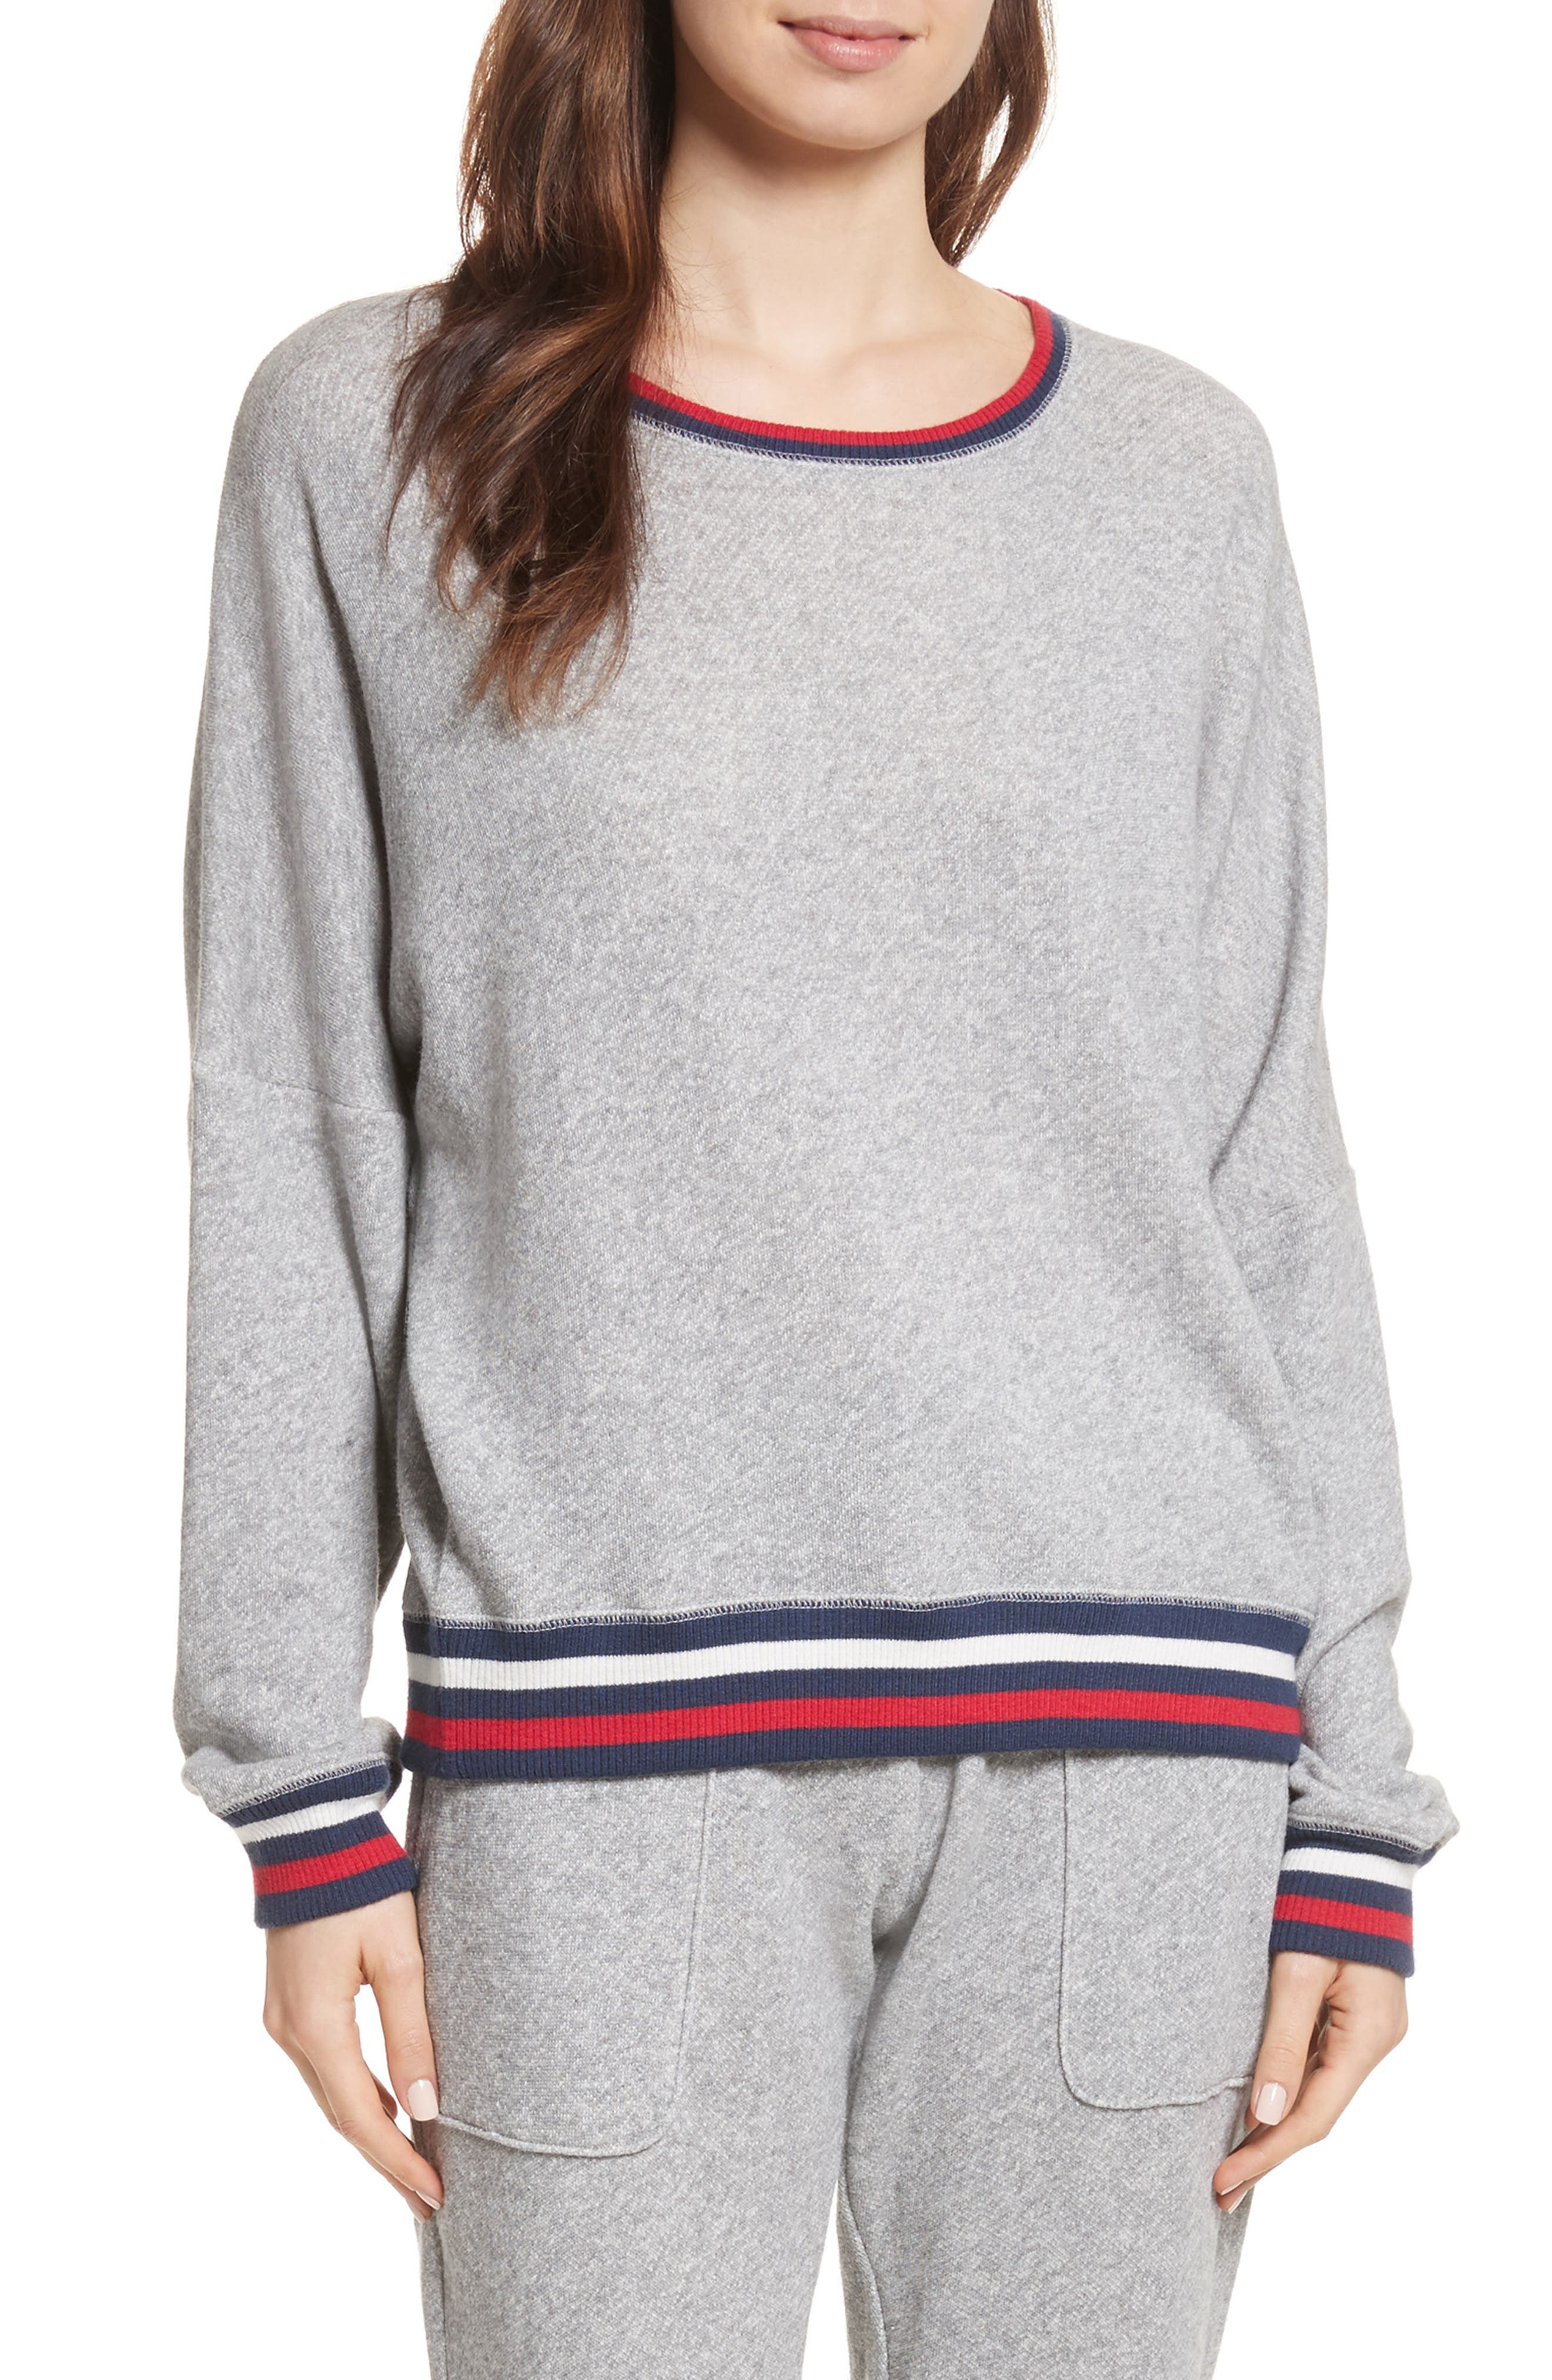 Richardine B Sweatshirt,                         Main,                         color, Heather Grey